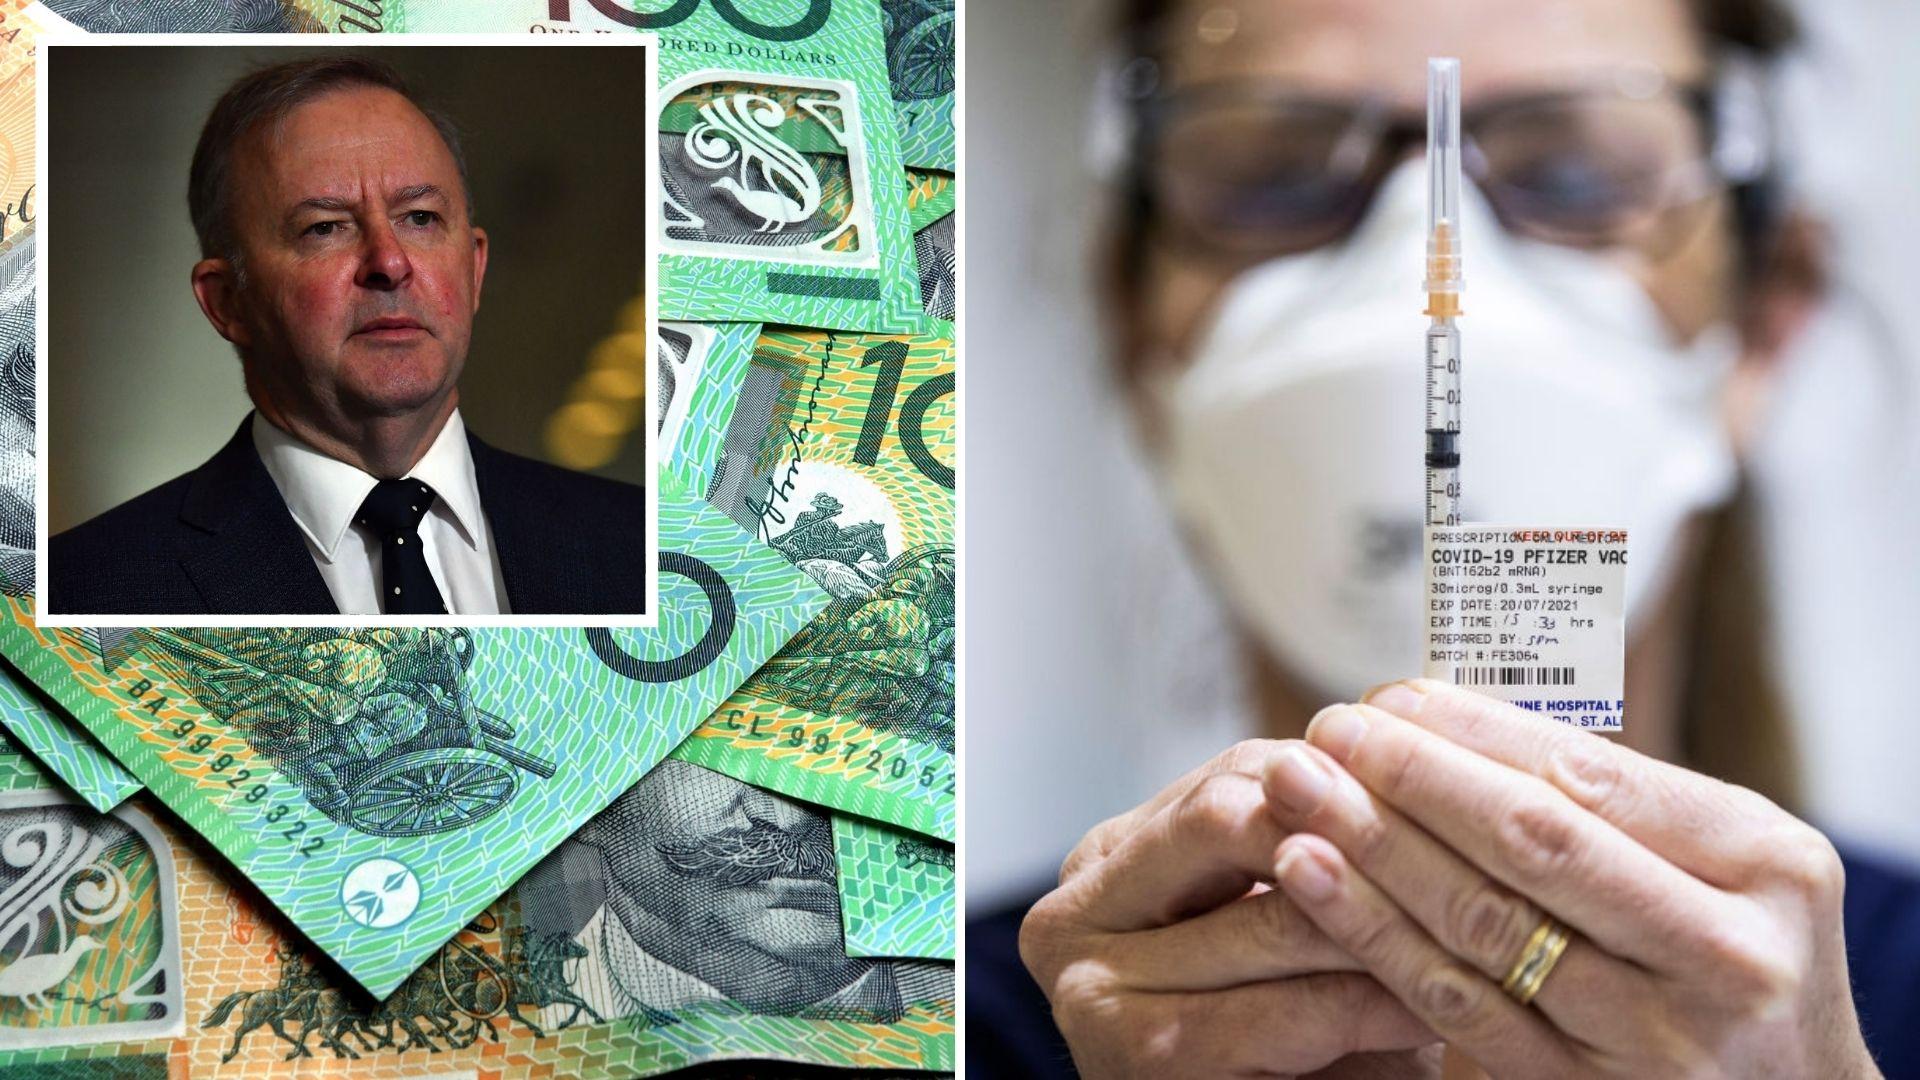 Doctors back $300 COVID-19 vaccination cash